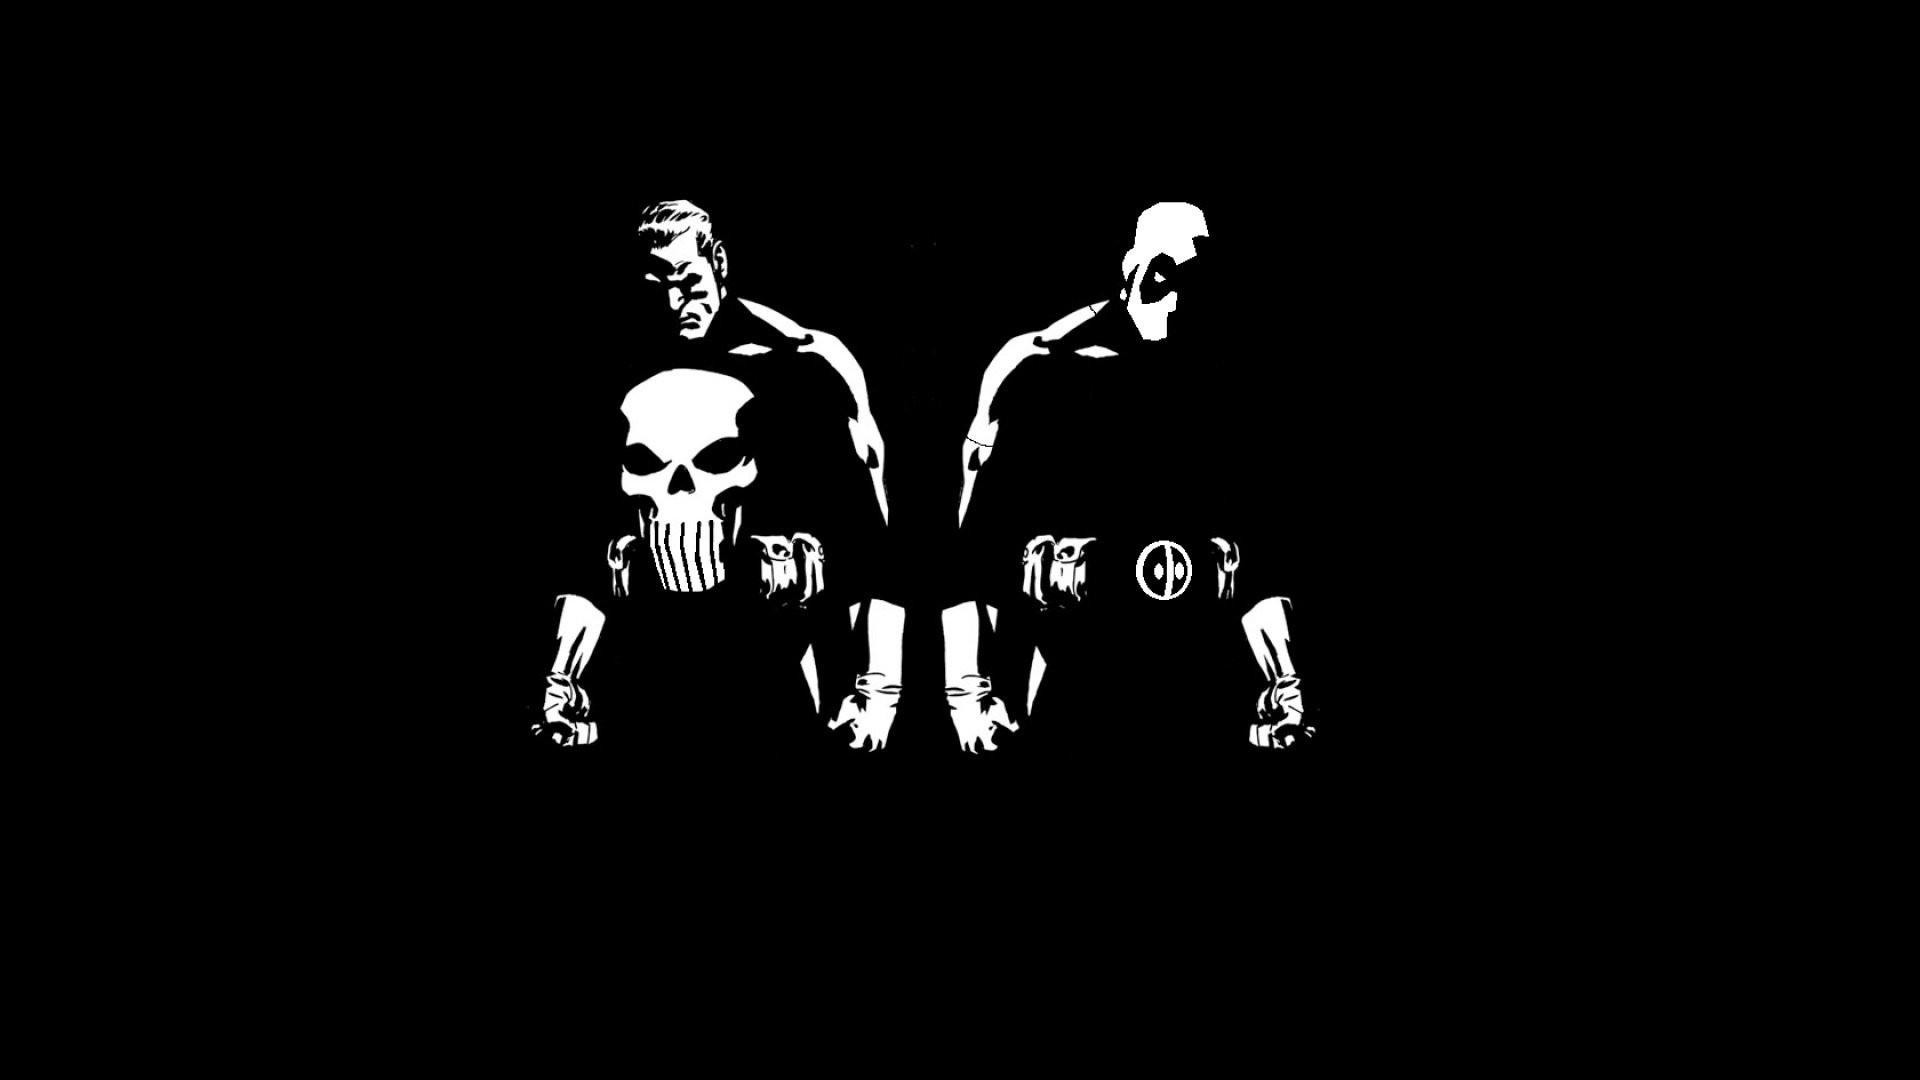 Punishermax Comic Wallpapers   WallpapersIn4k.net